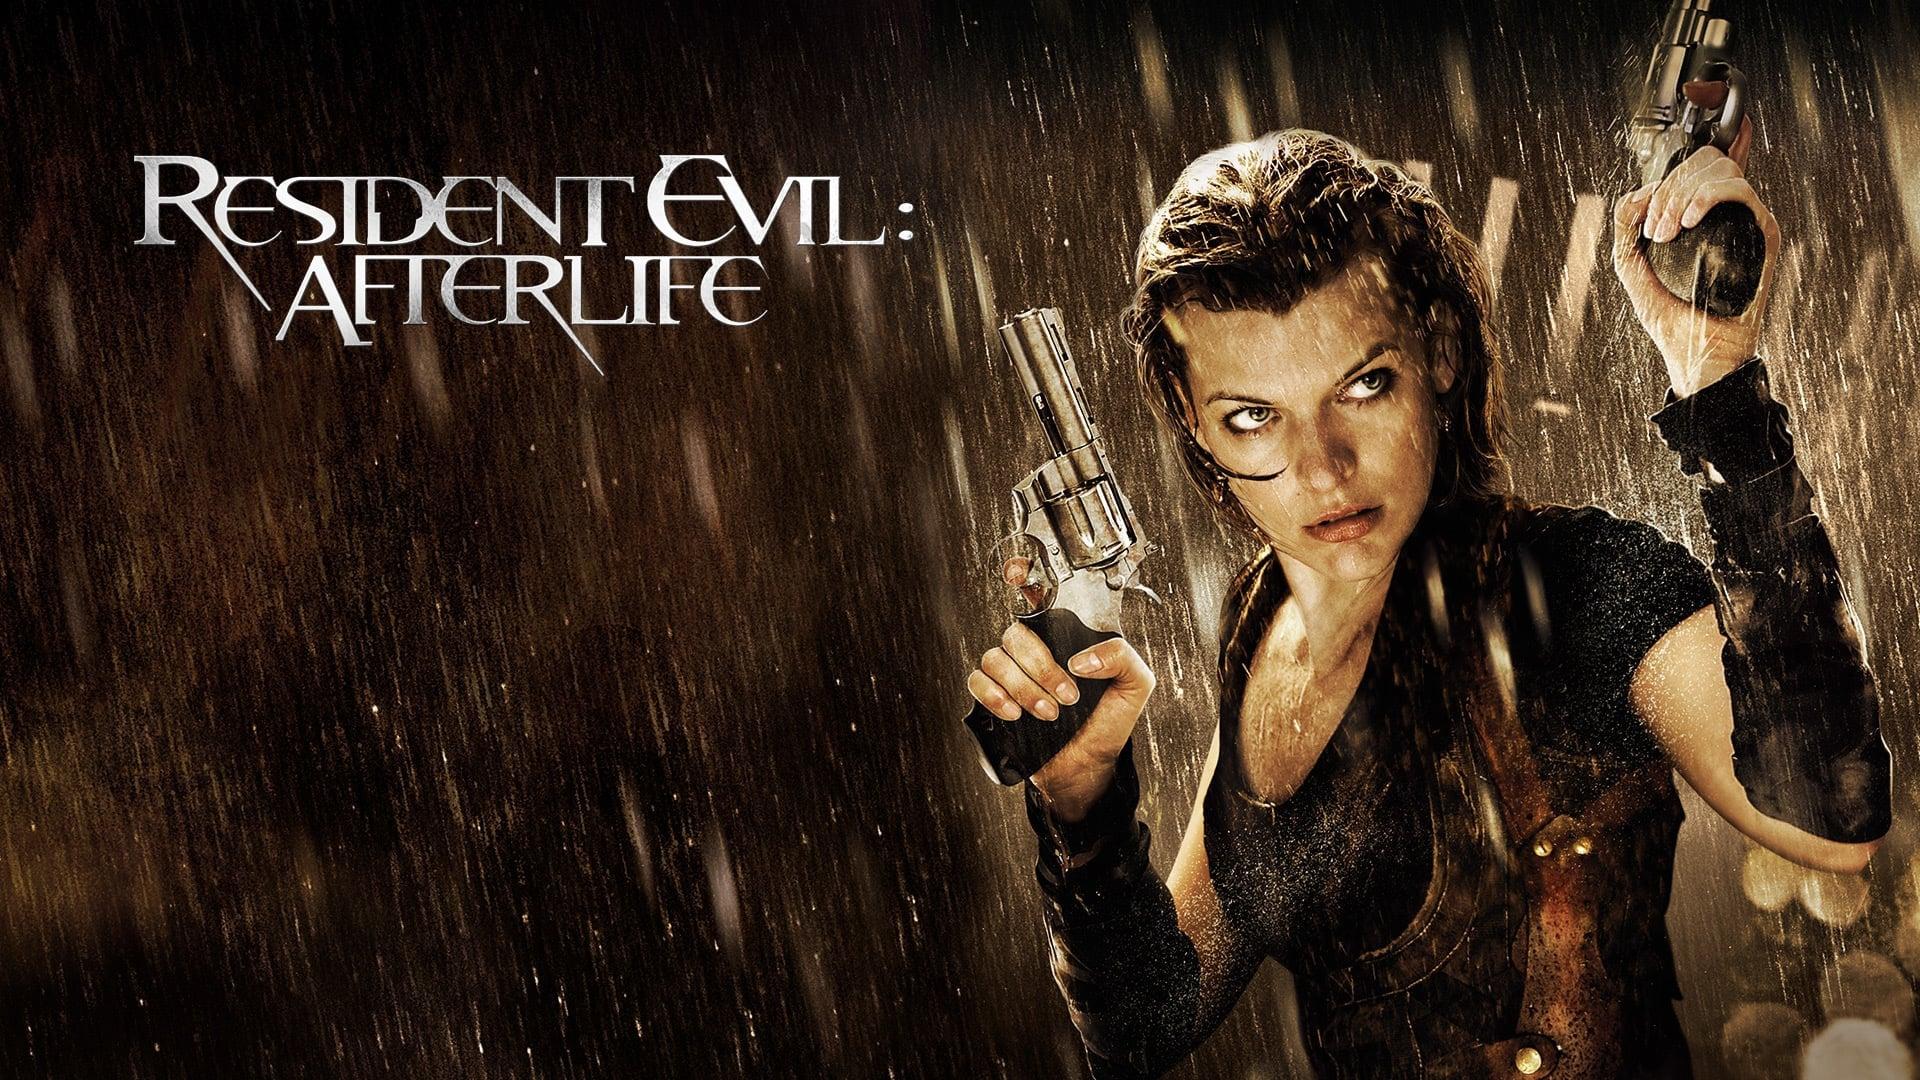 resident evil 4 afterlife full movie online free